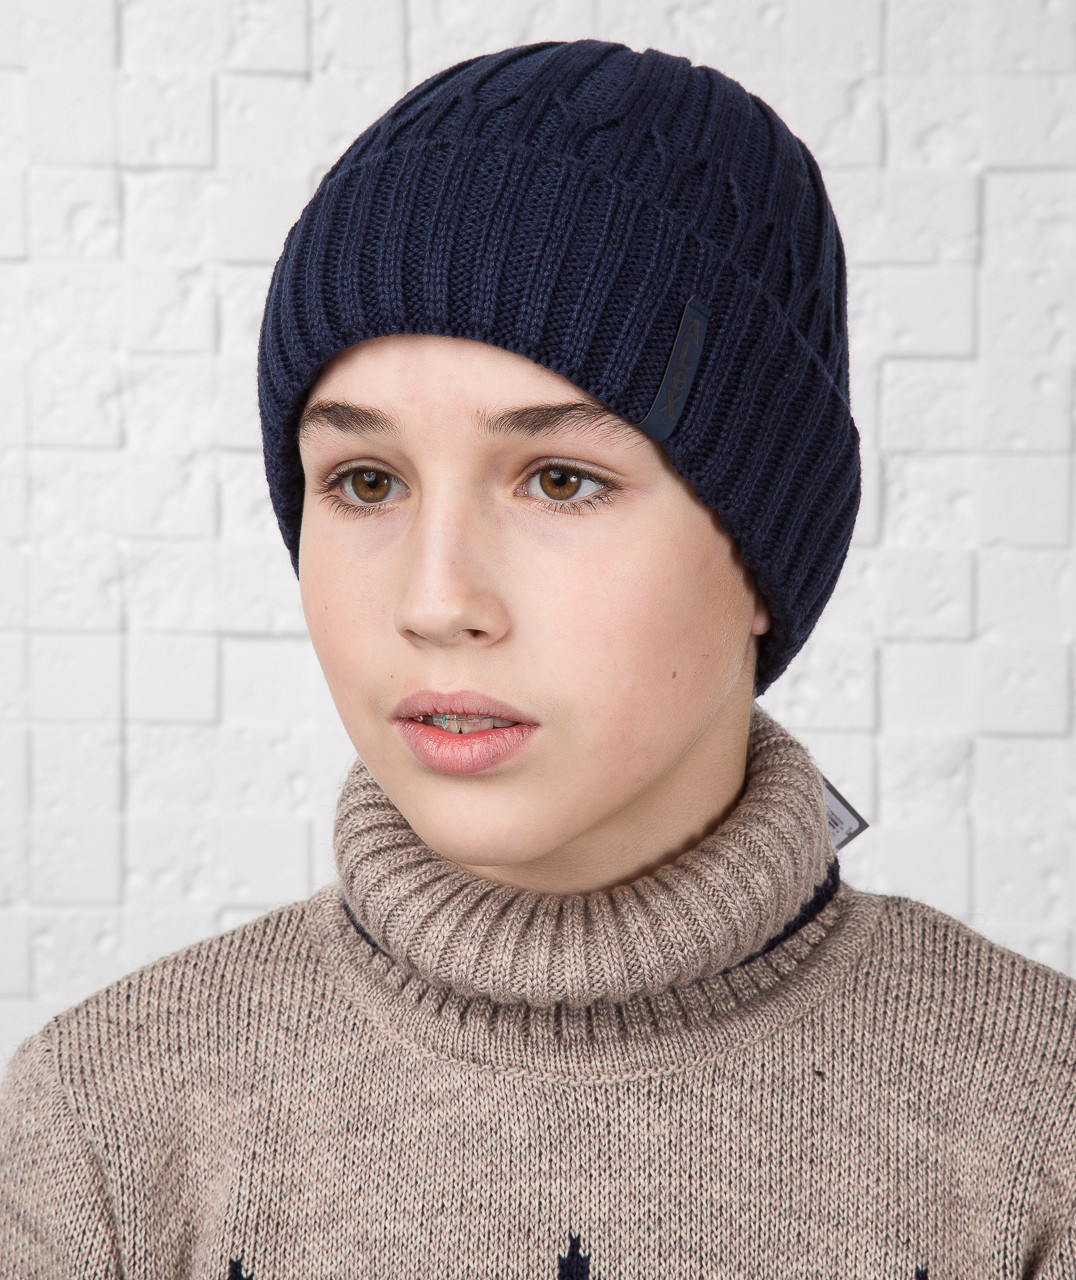 Зимняя вязаная шапка для мальчика подростка - Артикул AL17029